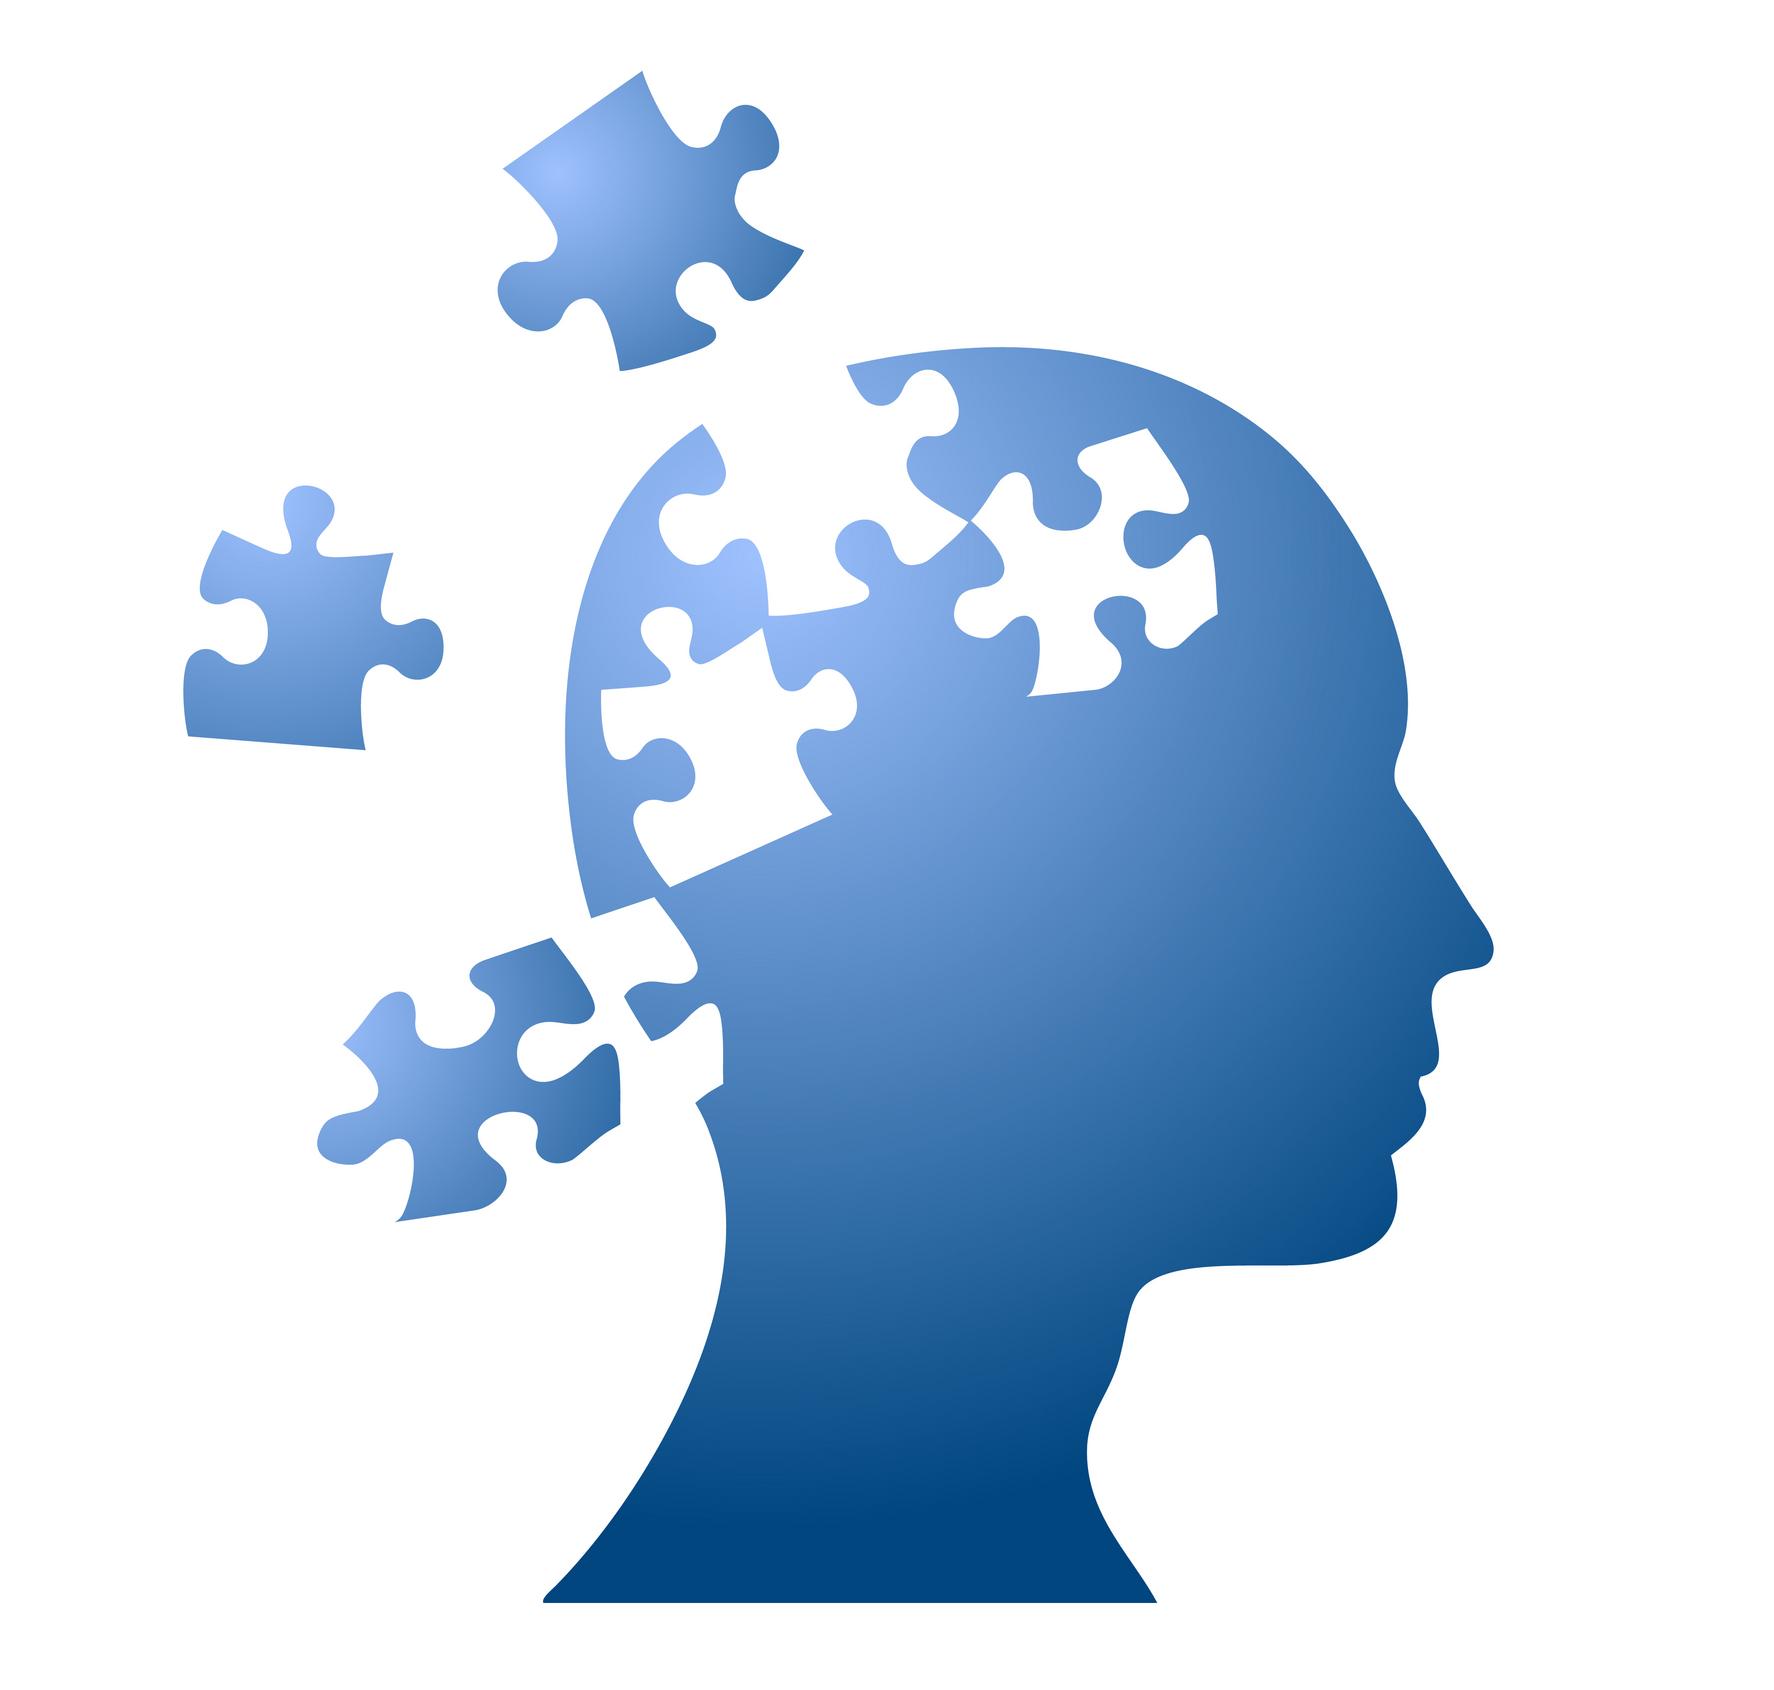 brain-puzzle-clip-art-1913505